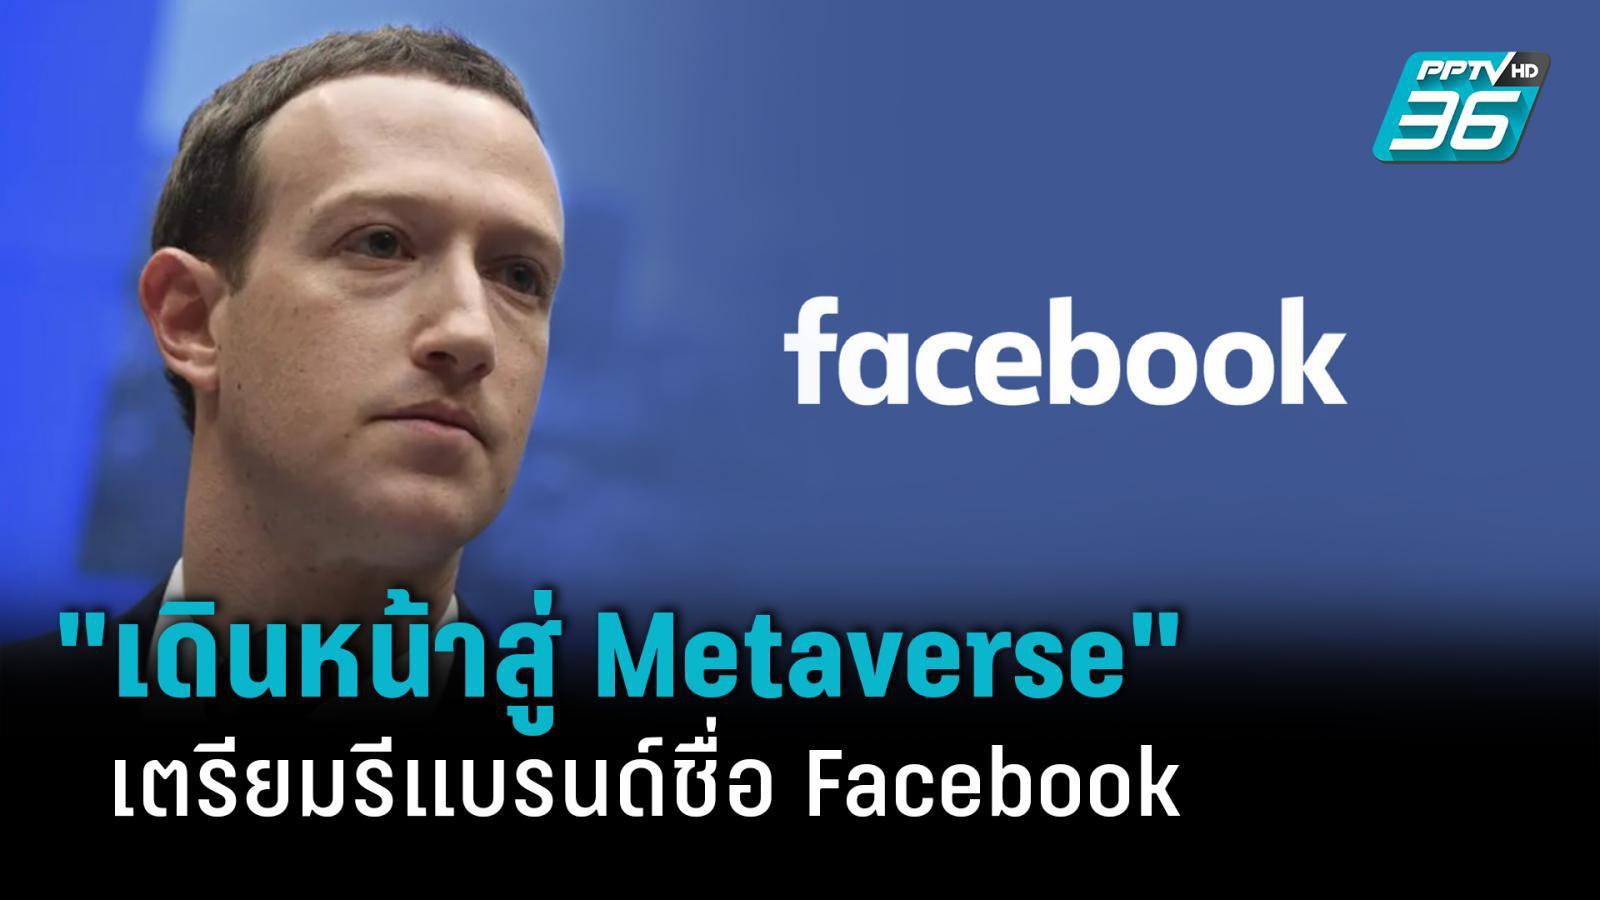 Facebook เตรียมรีแบรนด์ เดินหน้าสู่ เทคโนโลยีโลกดิจิทัลเสมือนจริง